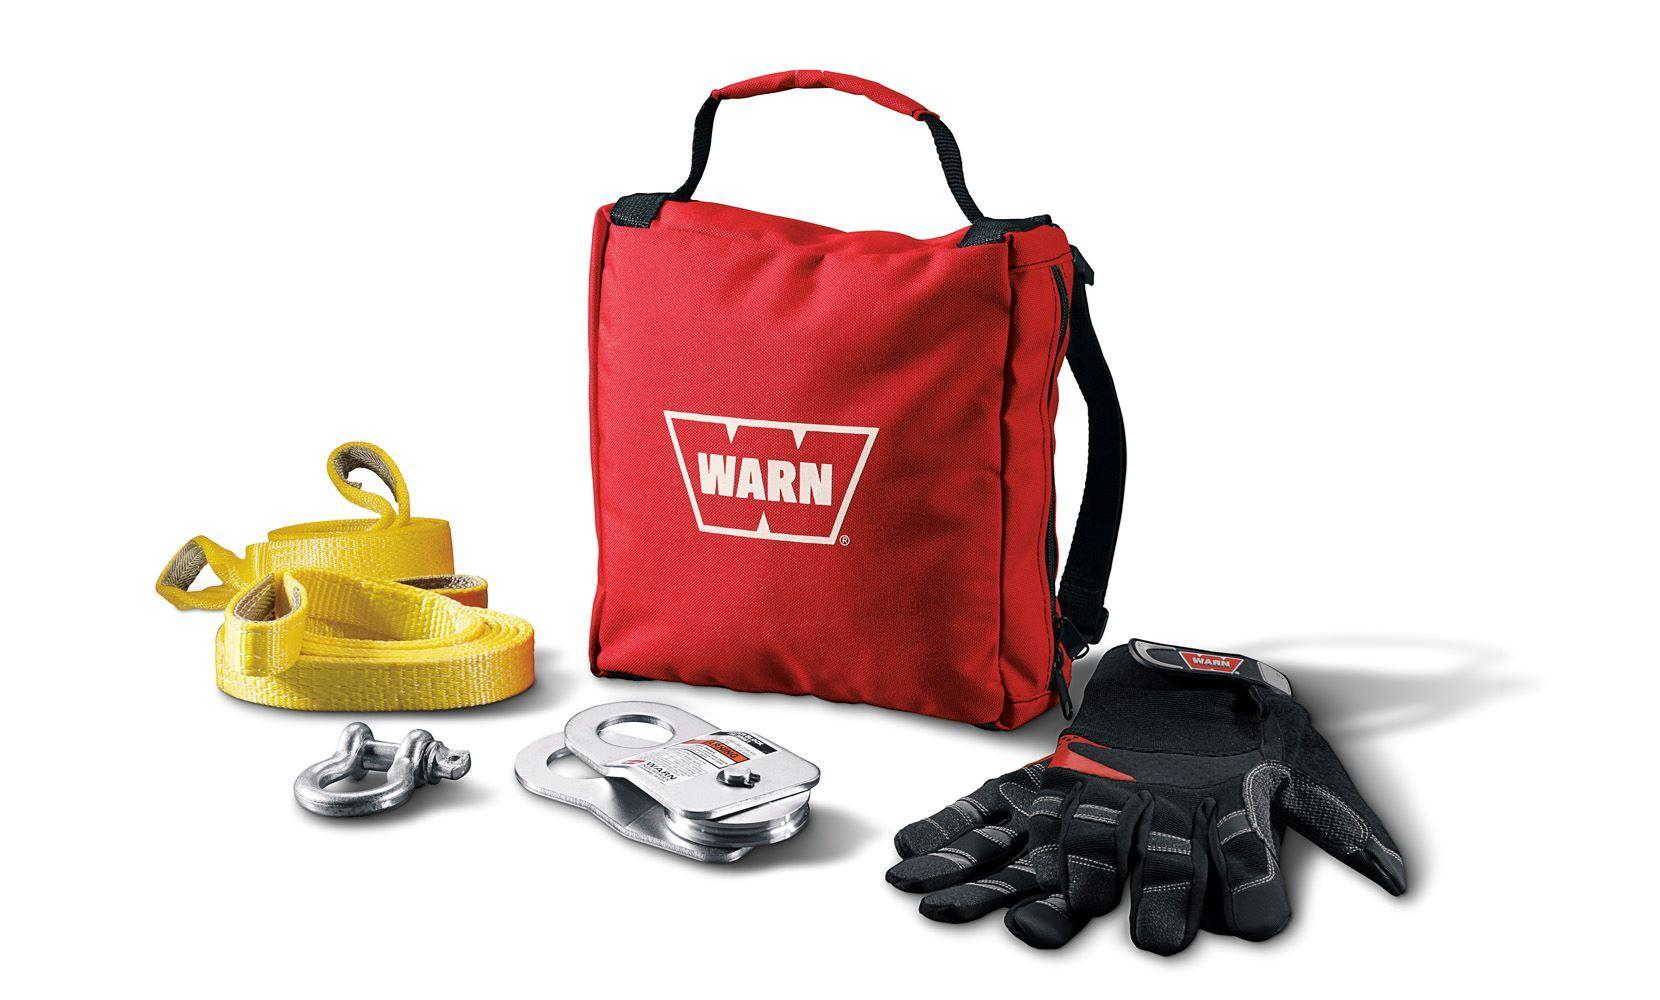 0001400_light-duty-winch-accessory-kit-88915.jpeg